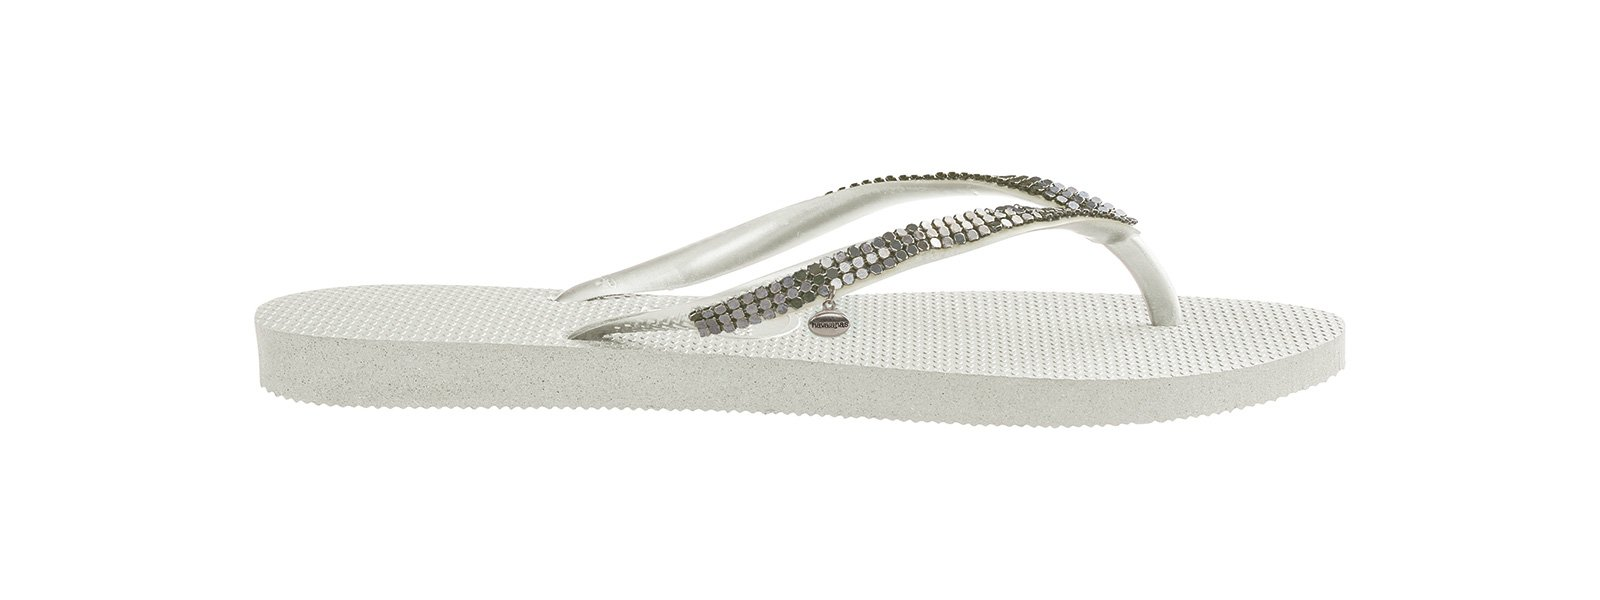 bbe7ada73cdd ... White flip-flops with Swarovski crystals - Slim Crystal Mesh Sw White  ...